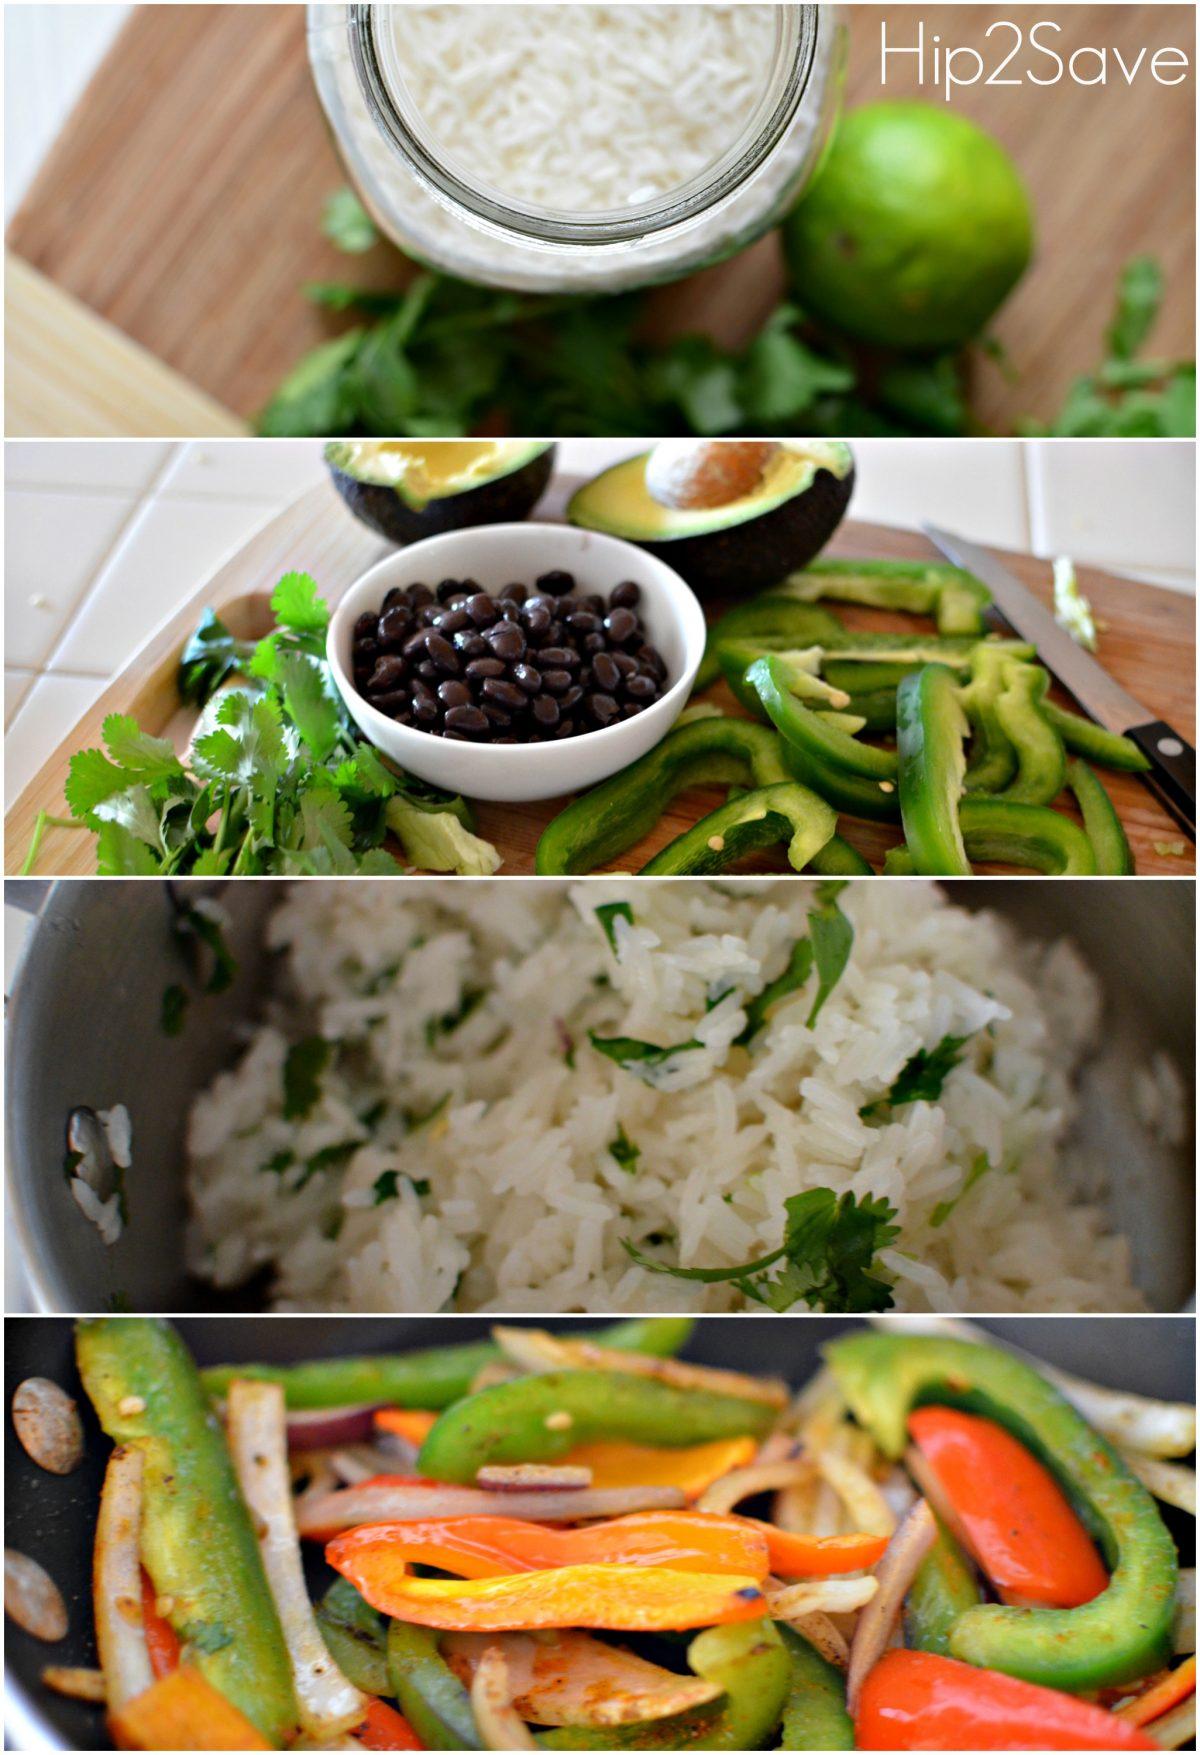 How to make a chipotle burrito bowl